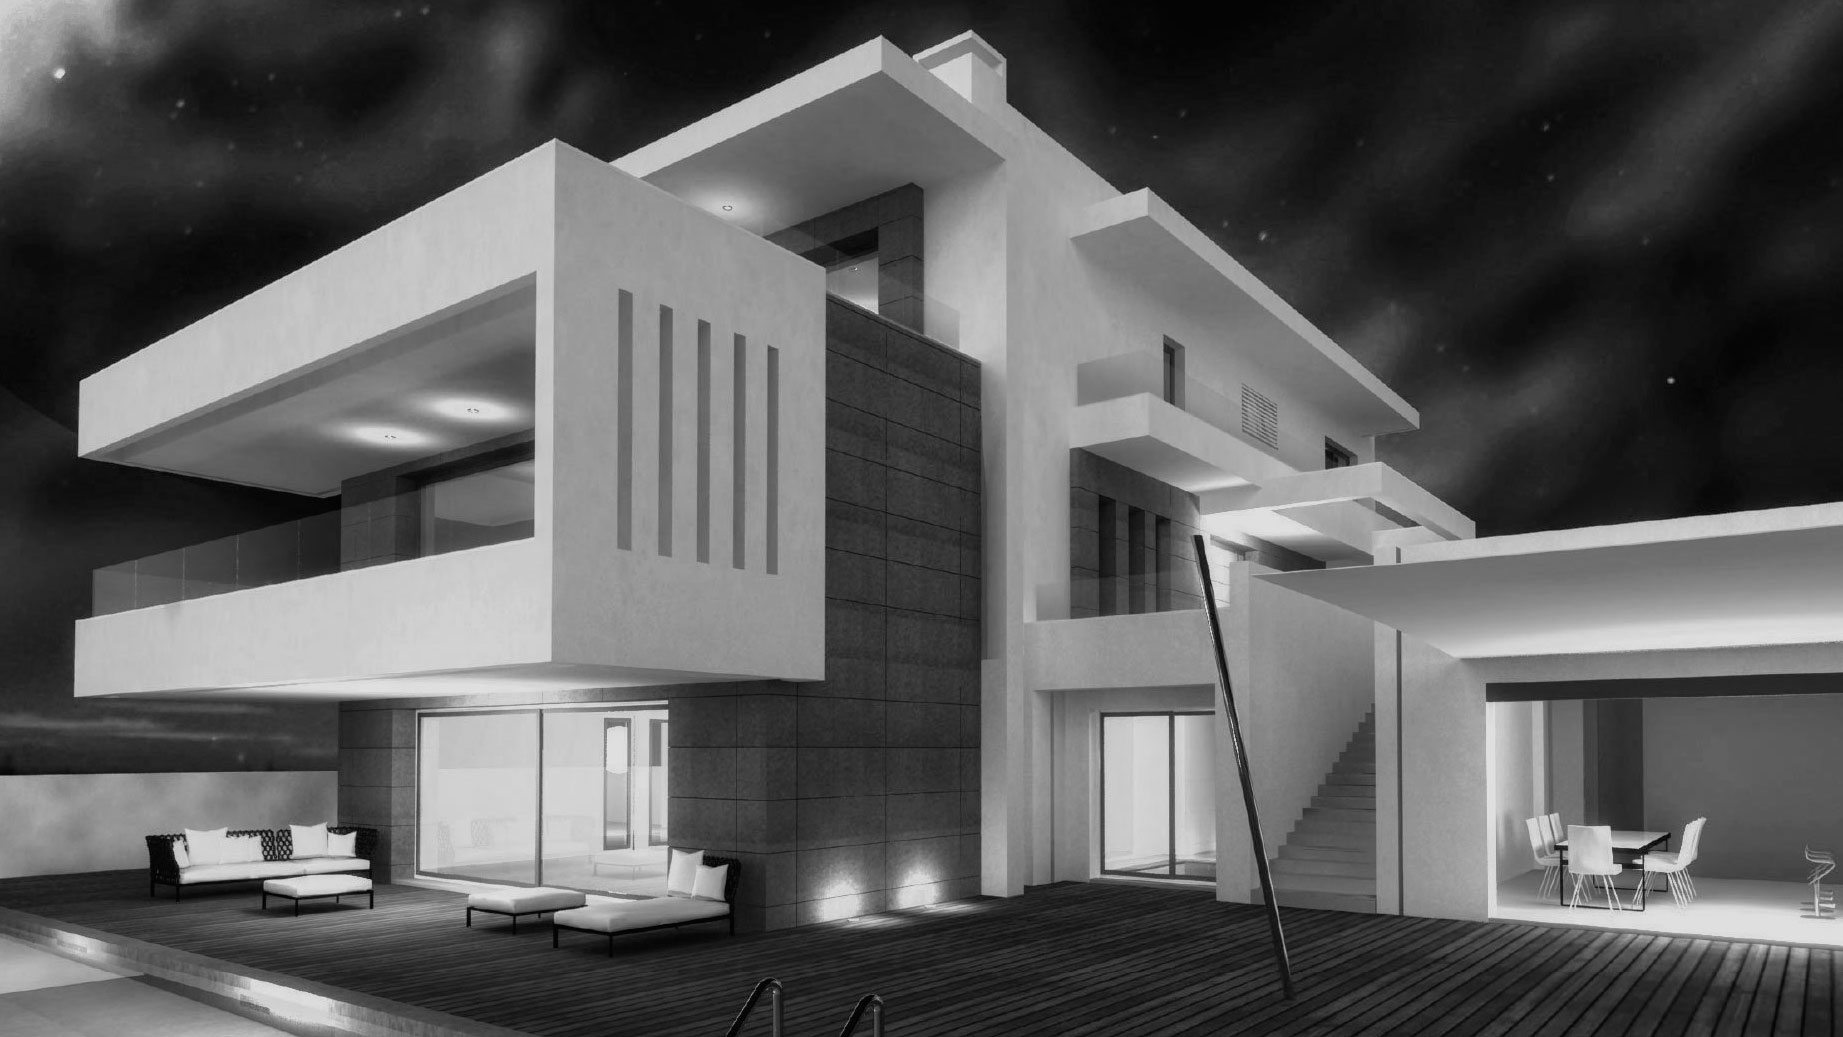 archicostudio_three-houses_featured